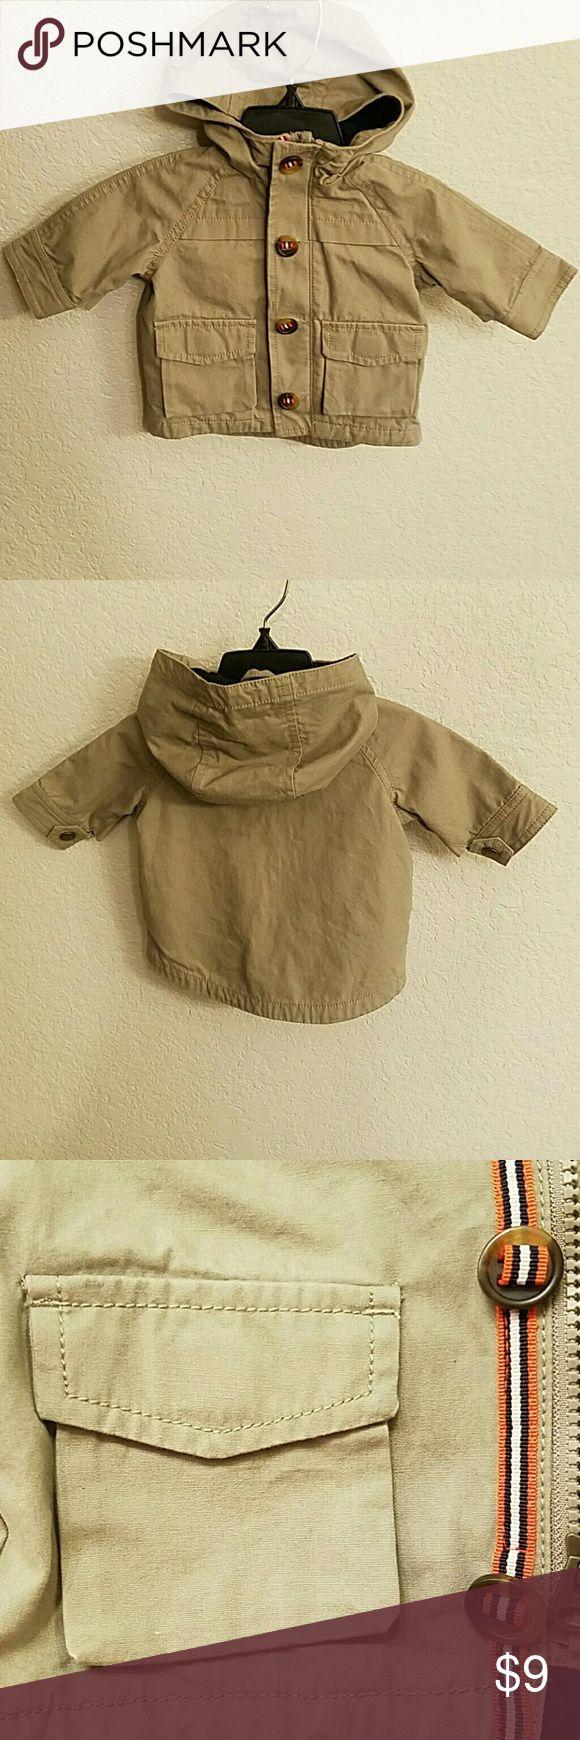 Baby Gap Infant Newborn Coat Excellent condition. Jackets & Coats